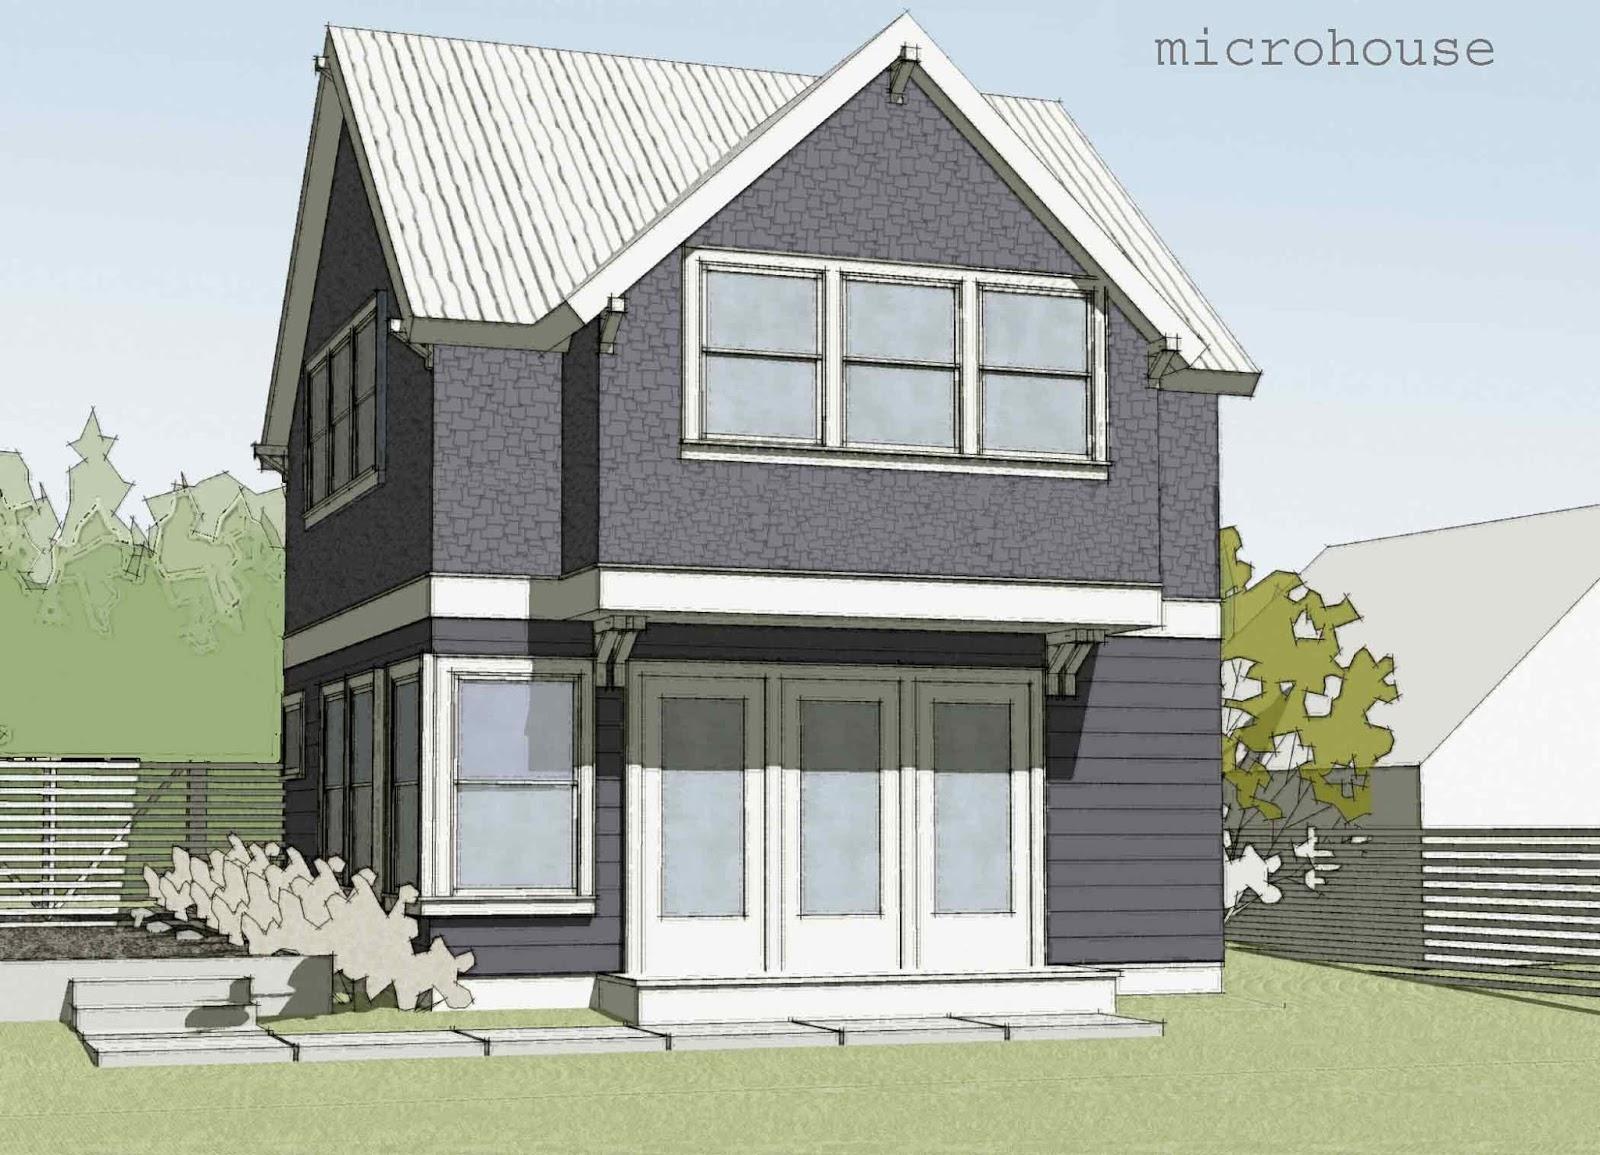 Backyard cottage blog projects for Backyard cottage seattle